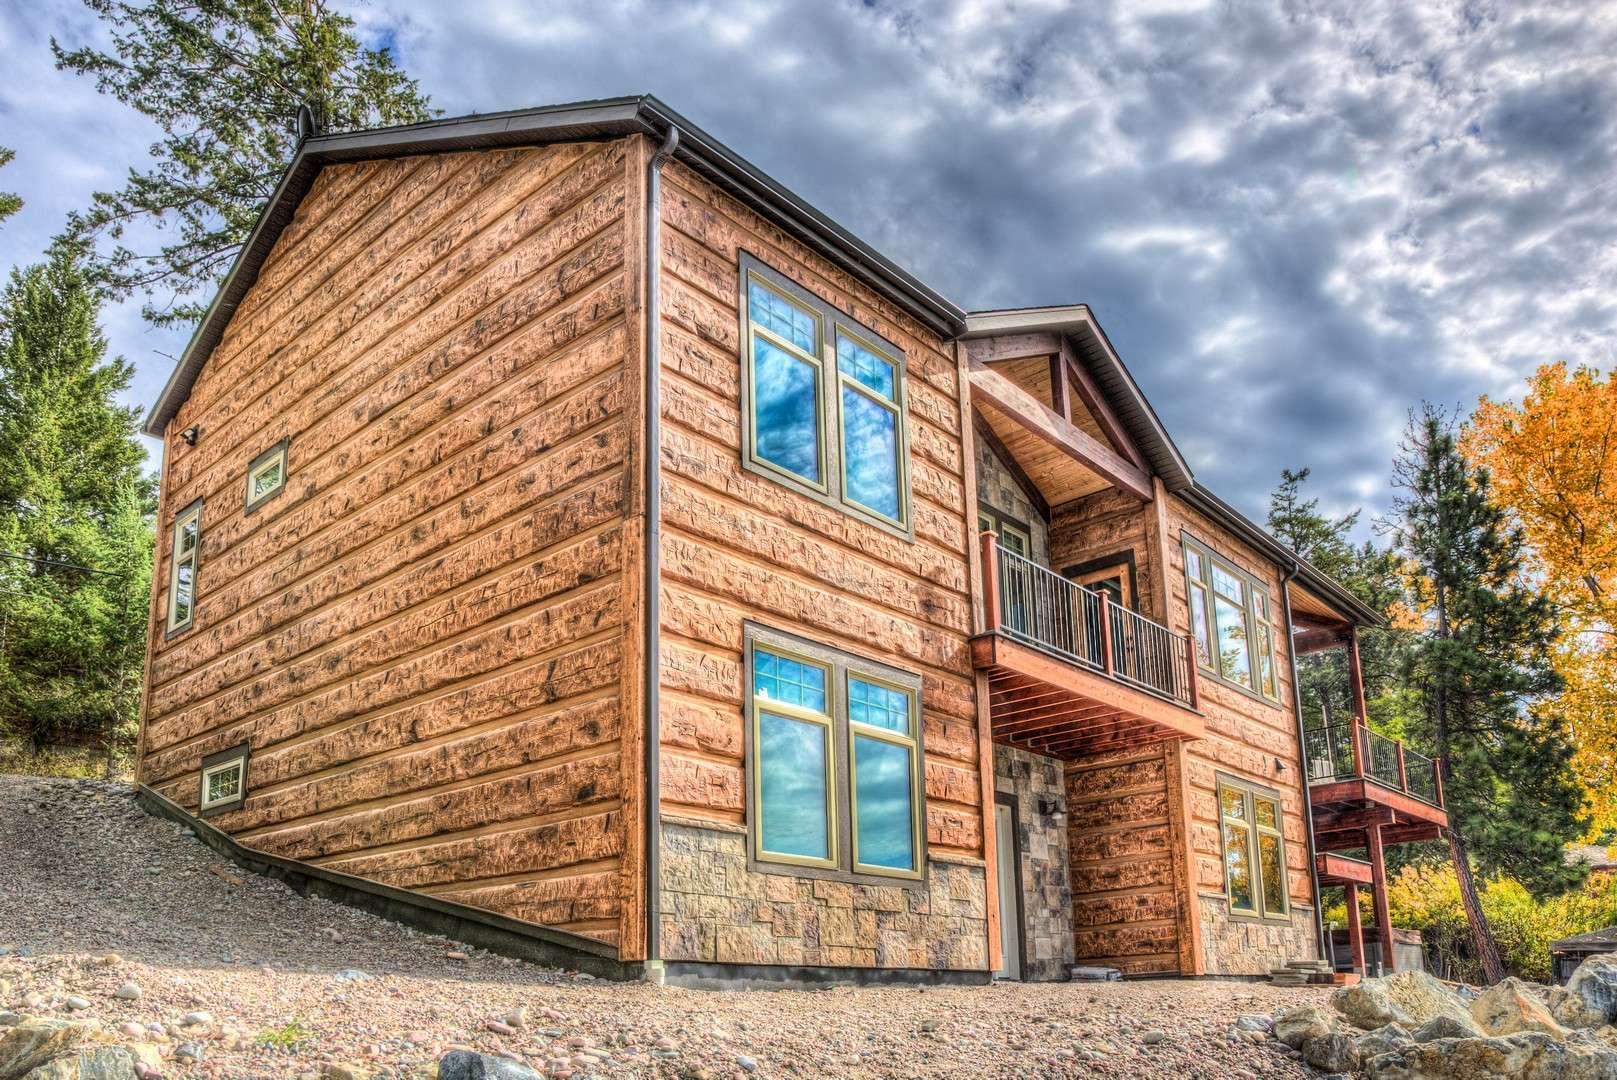 Kings point flathead lake montana concrete log siding for Concrete log cabins